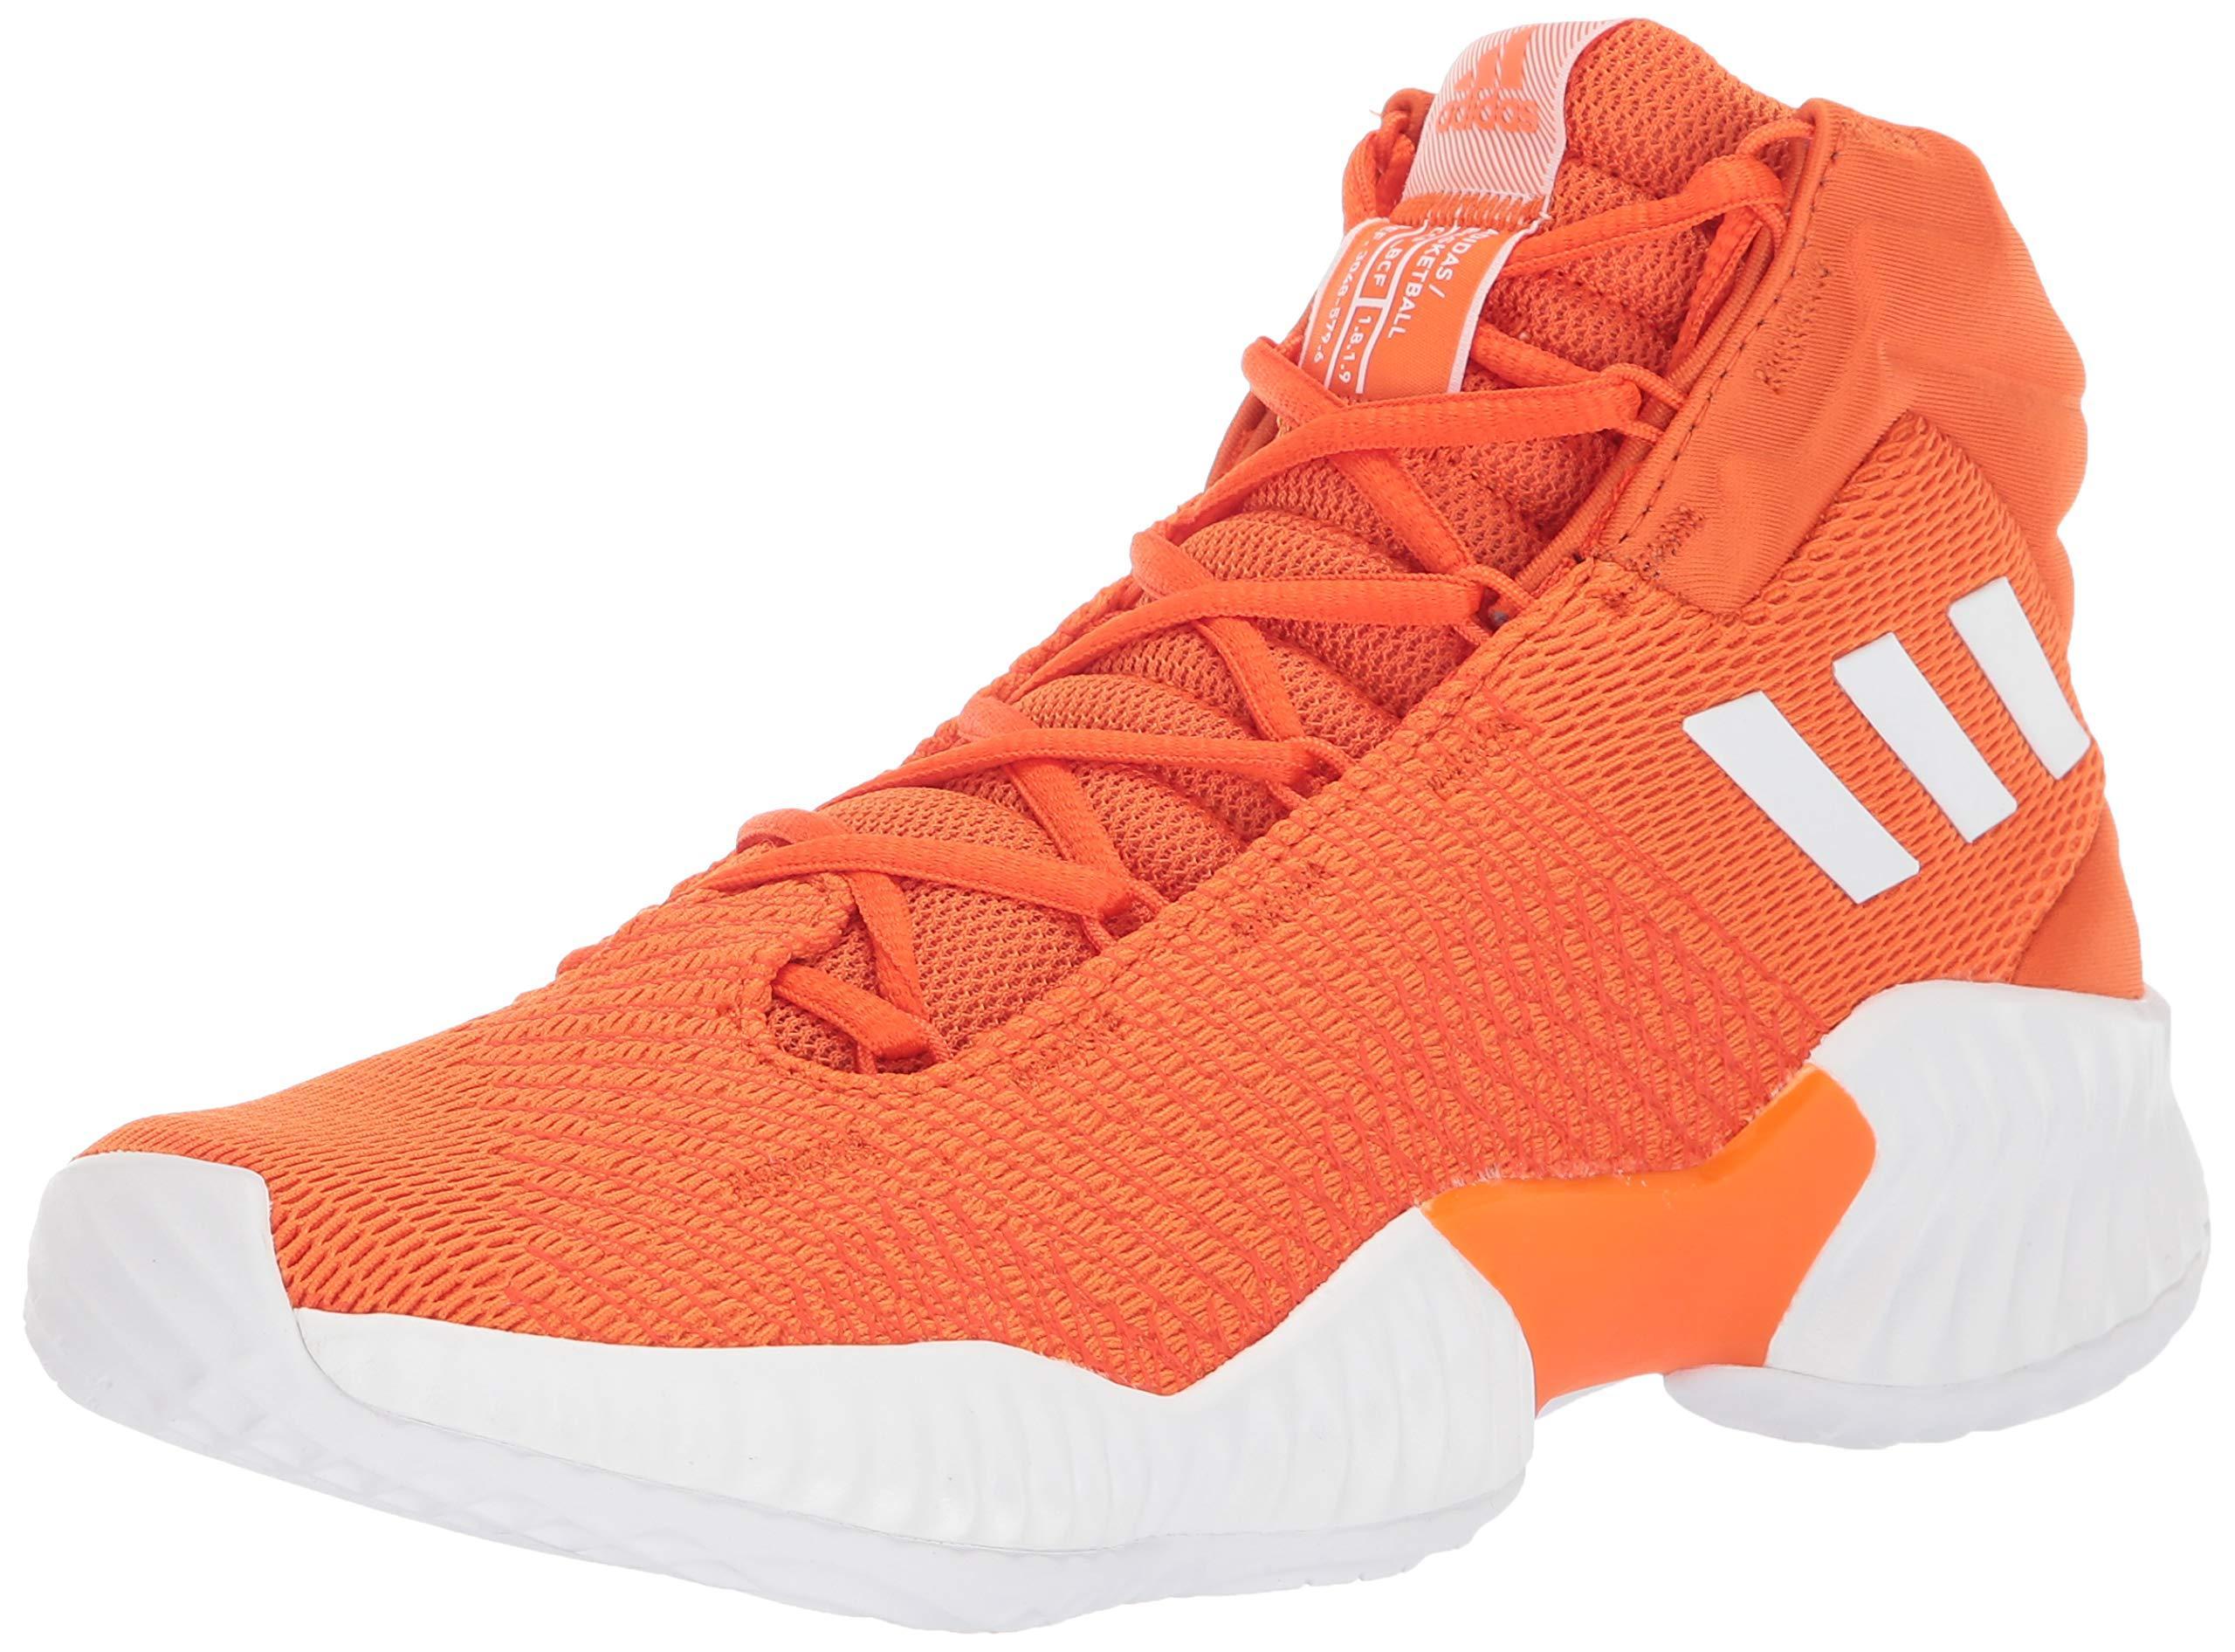 orange and white basketball shoes